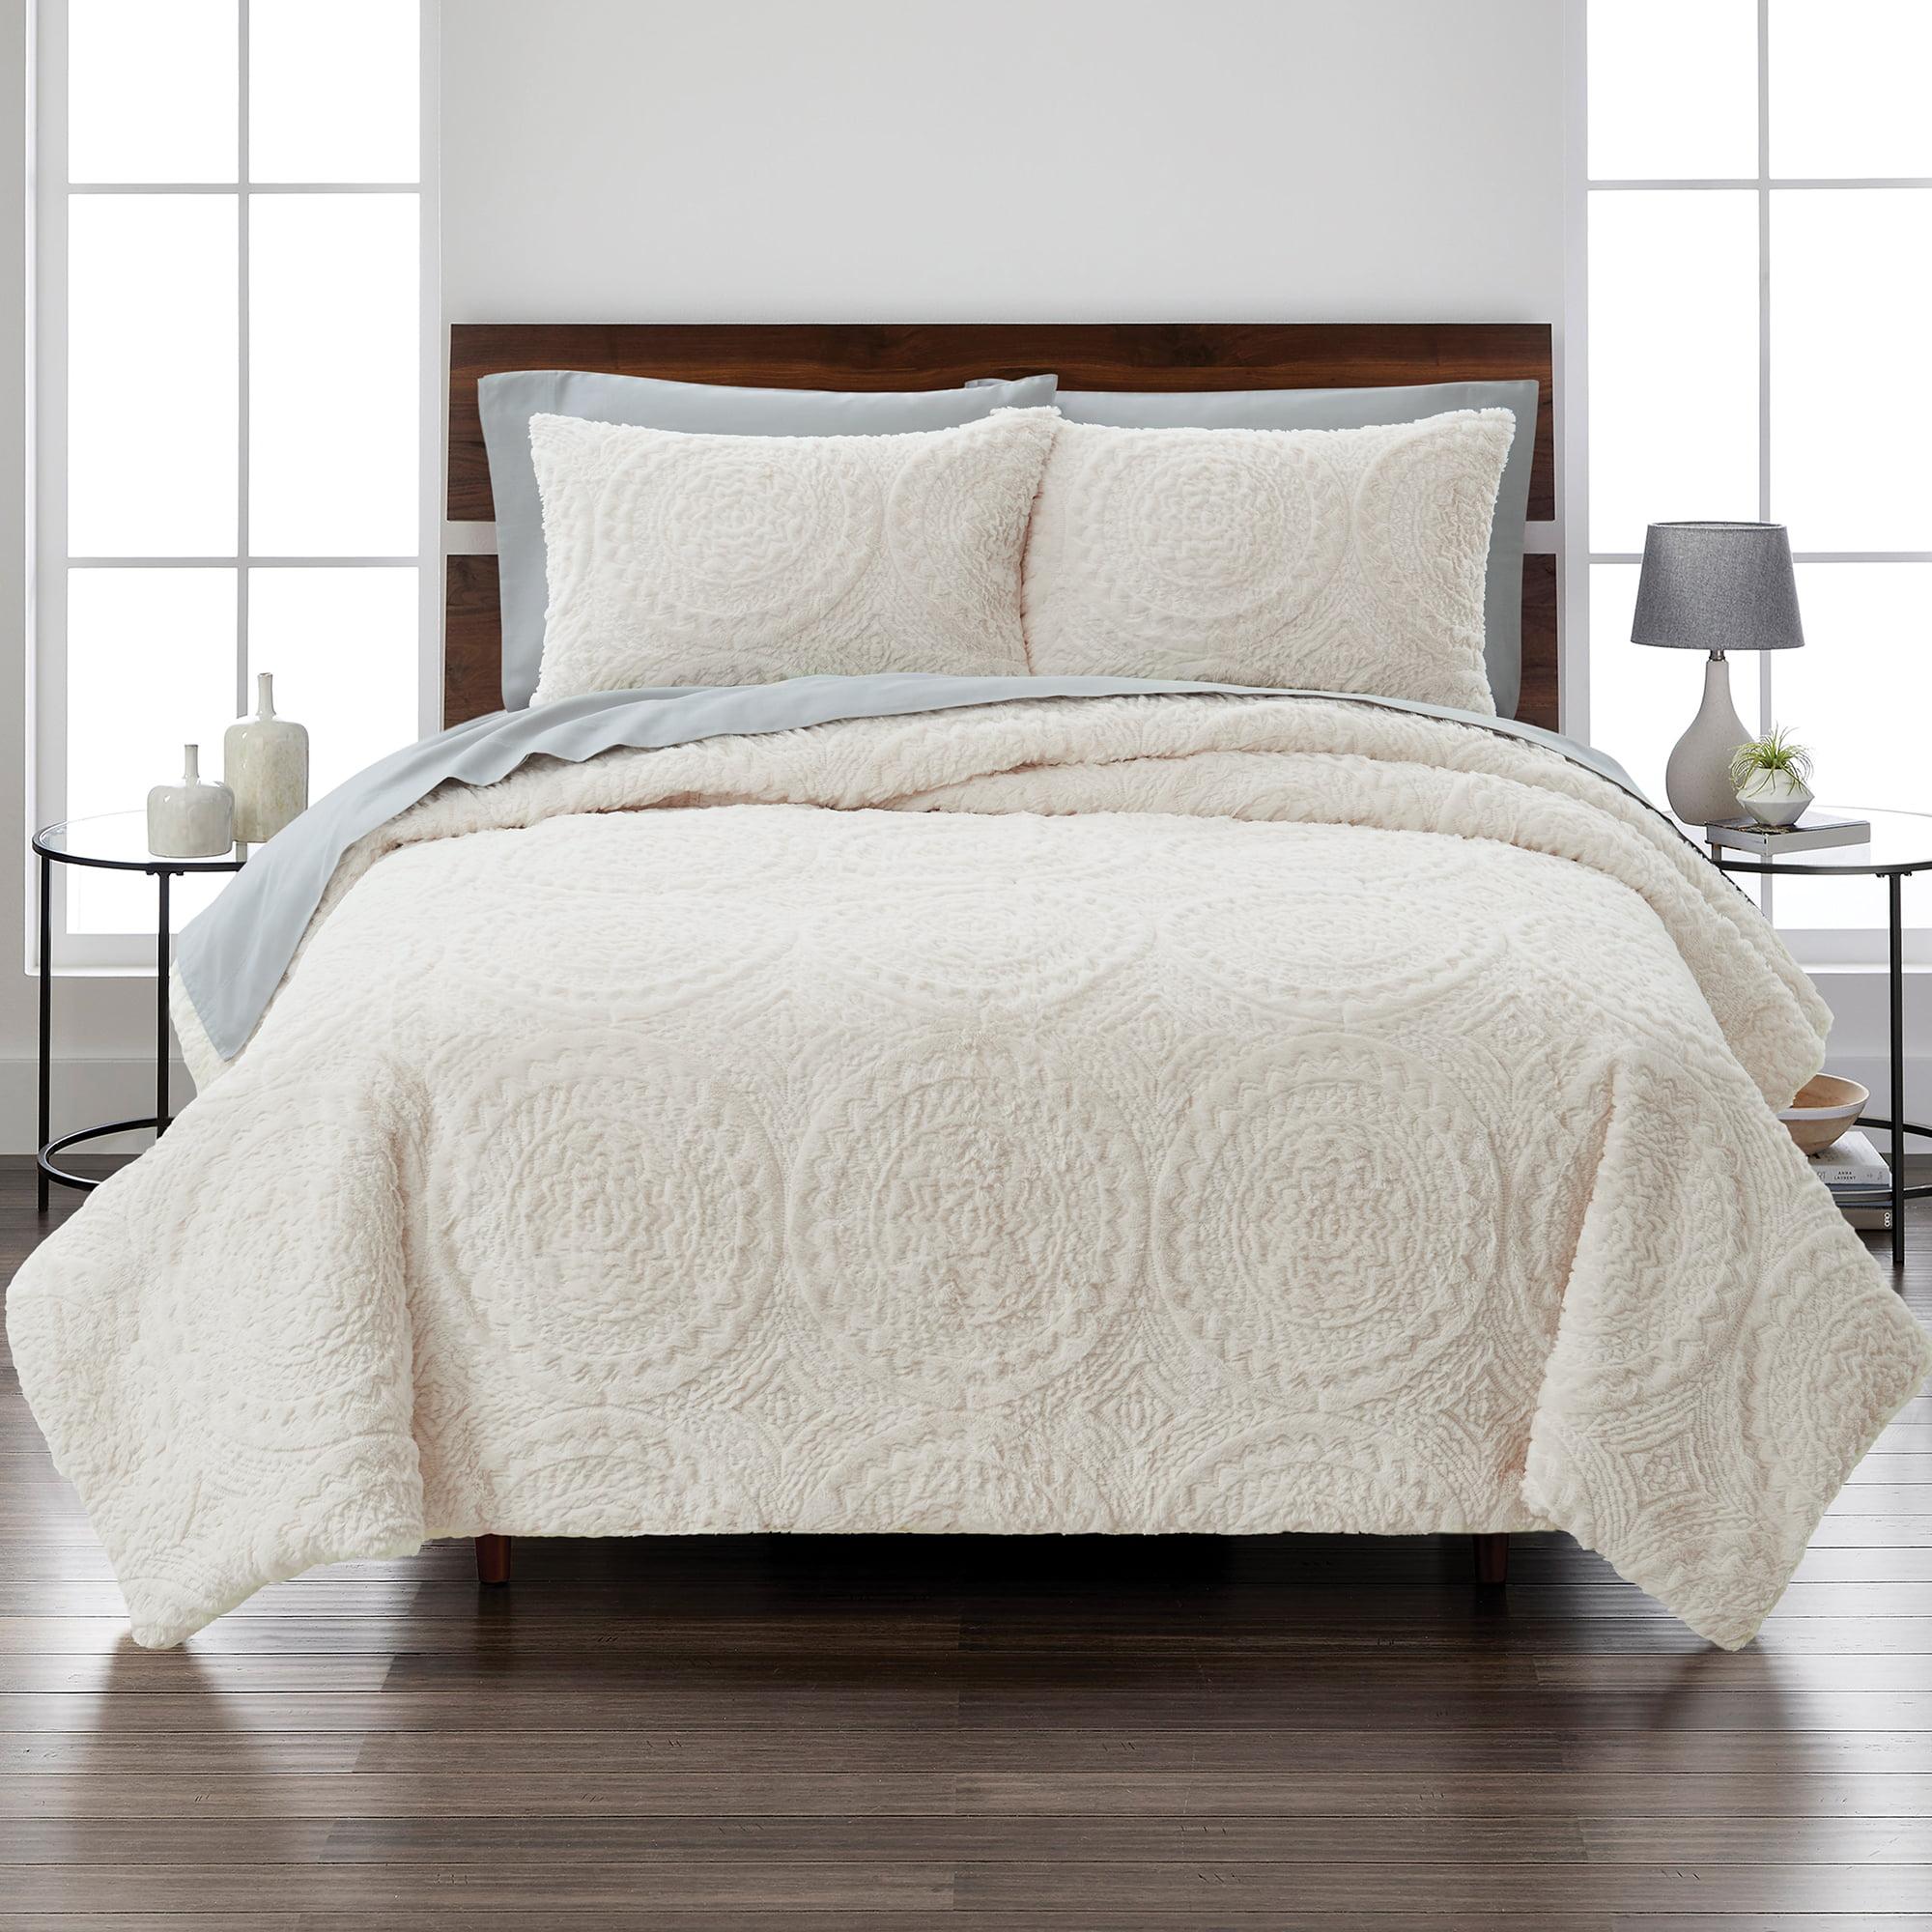 Better Homes Gardens Embroidered Faux Fur 3 Piece Comforter Set Full Queen Ivory Walmart Com Walmart Com